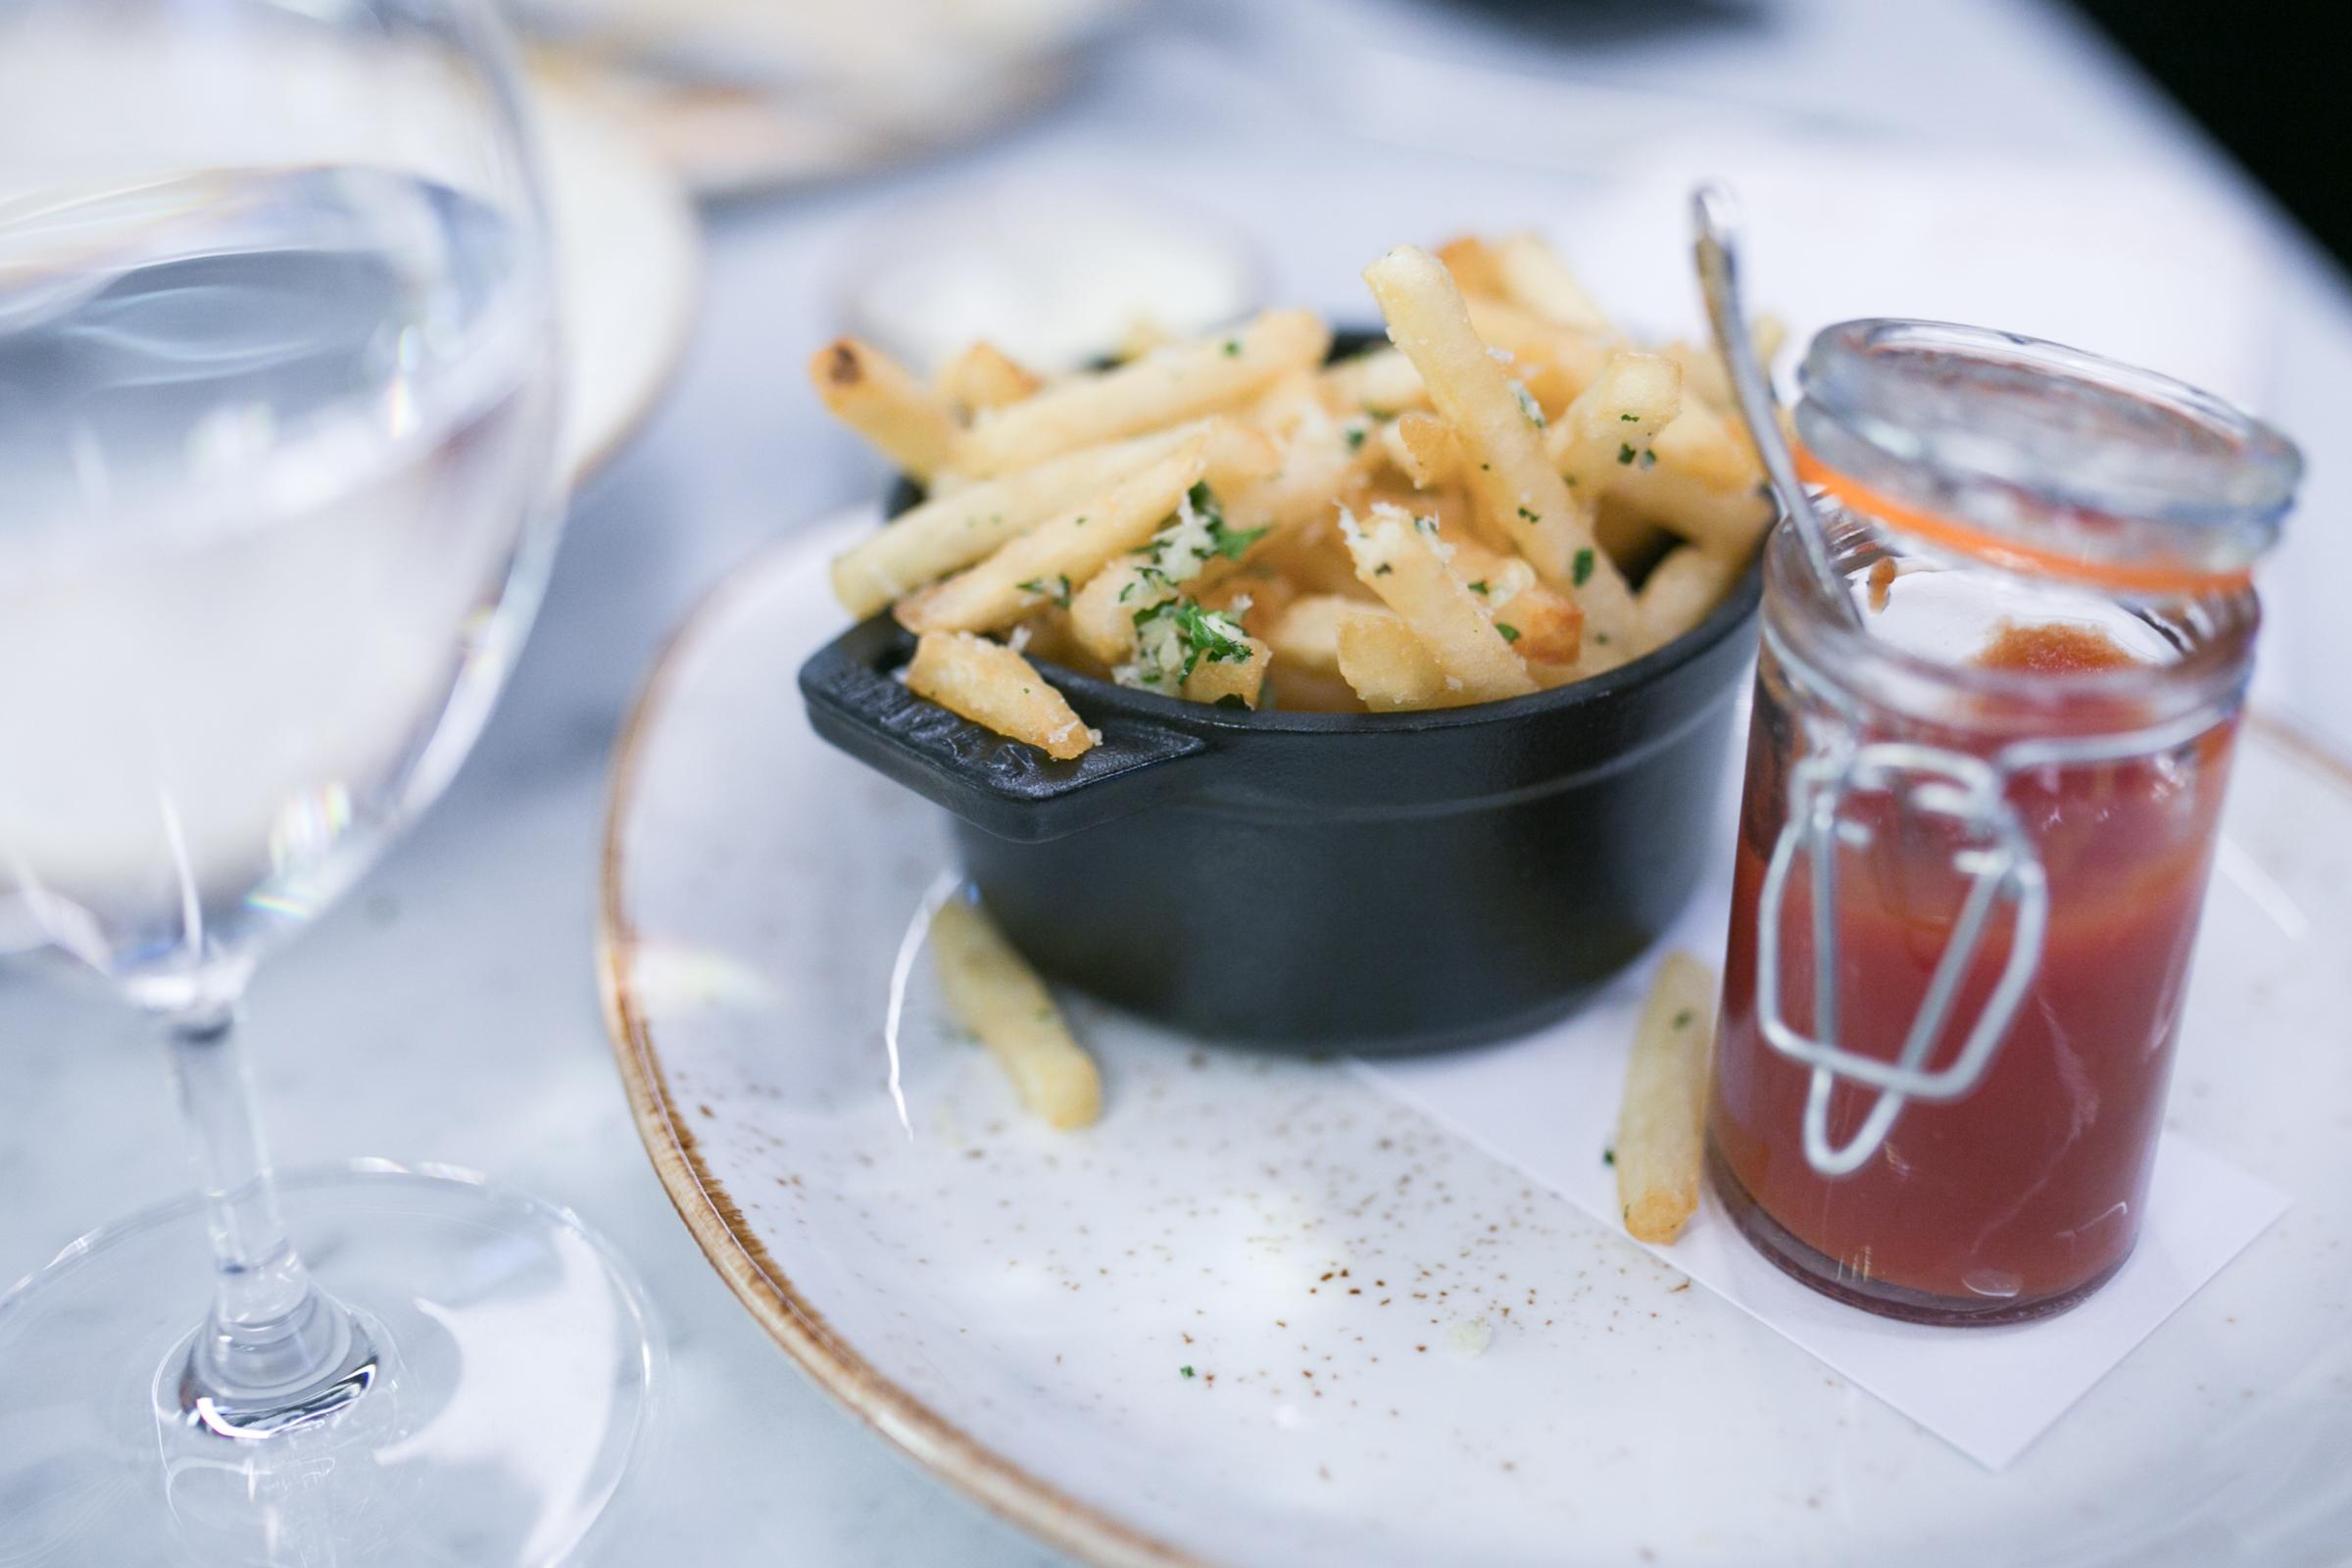 Caramel-restaurant-and-lounge-london-abu-dabi-dubai-oman-new-restaurant-in-london-minas-planet-review-jasmina-haskovic18.jpg